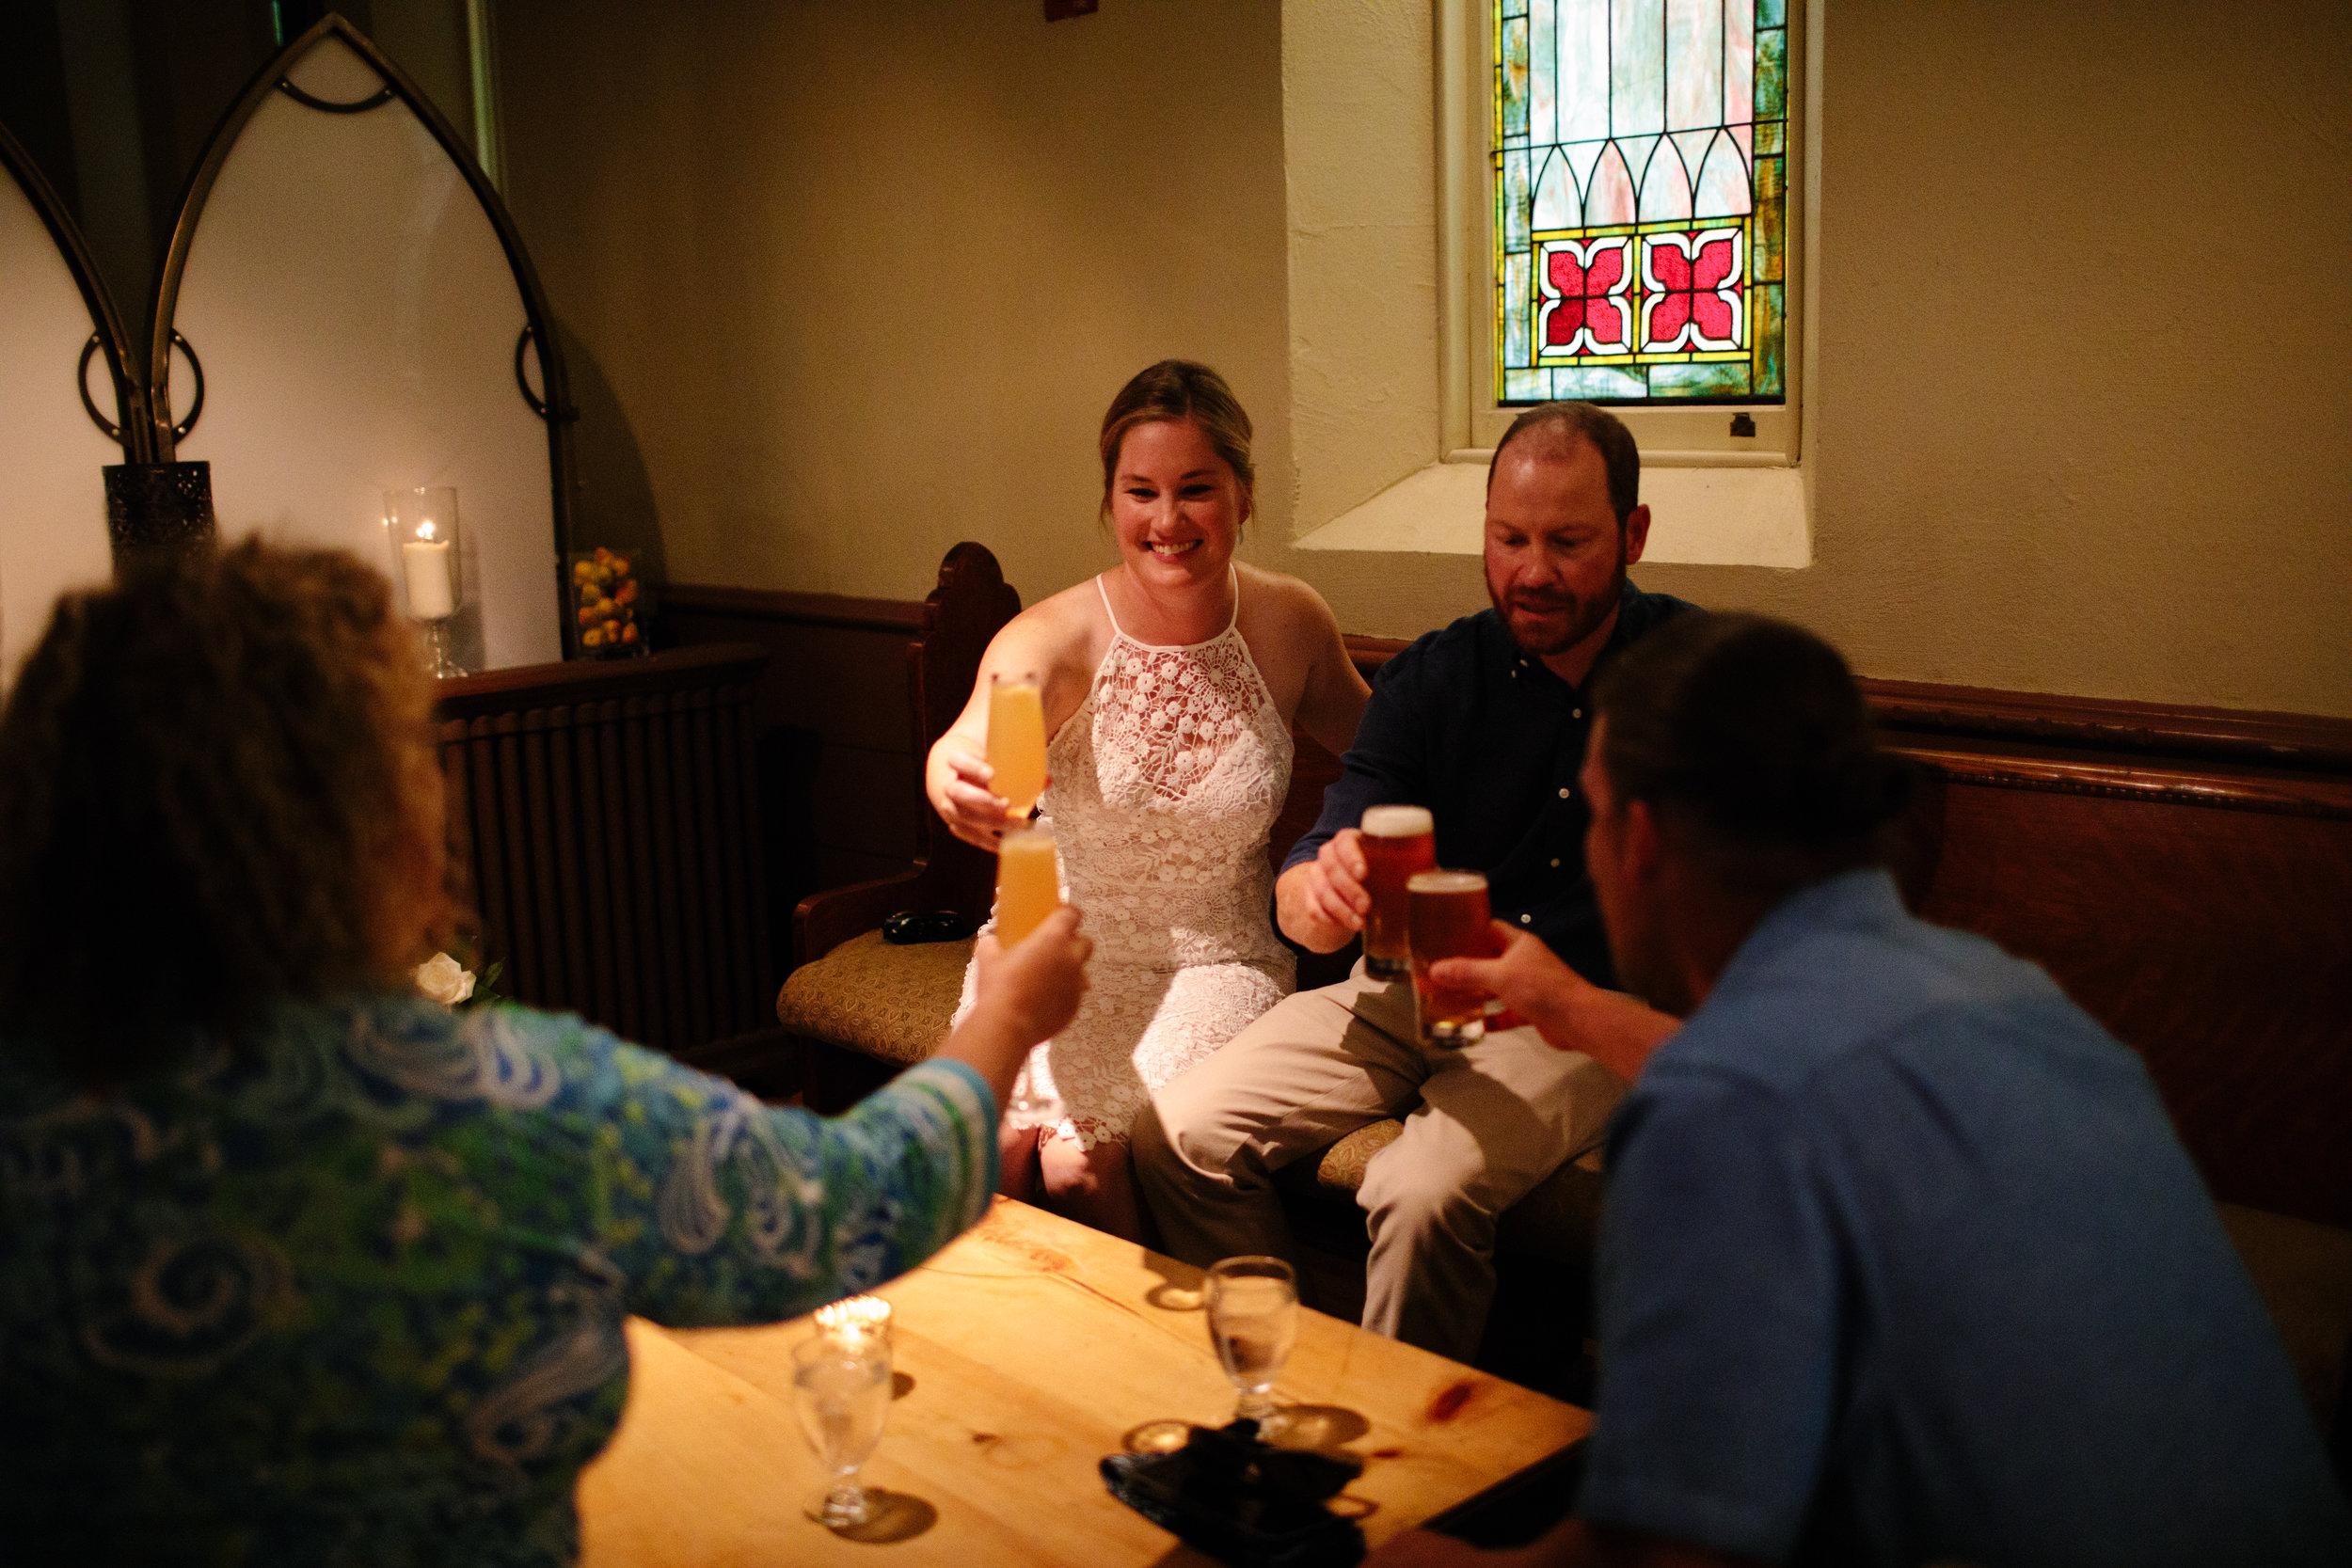 wedding-drinks-at-grace-portland-4.jpg